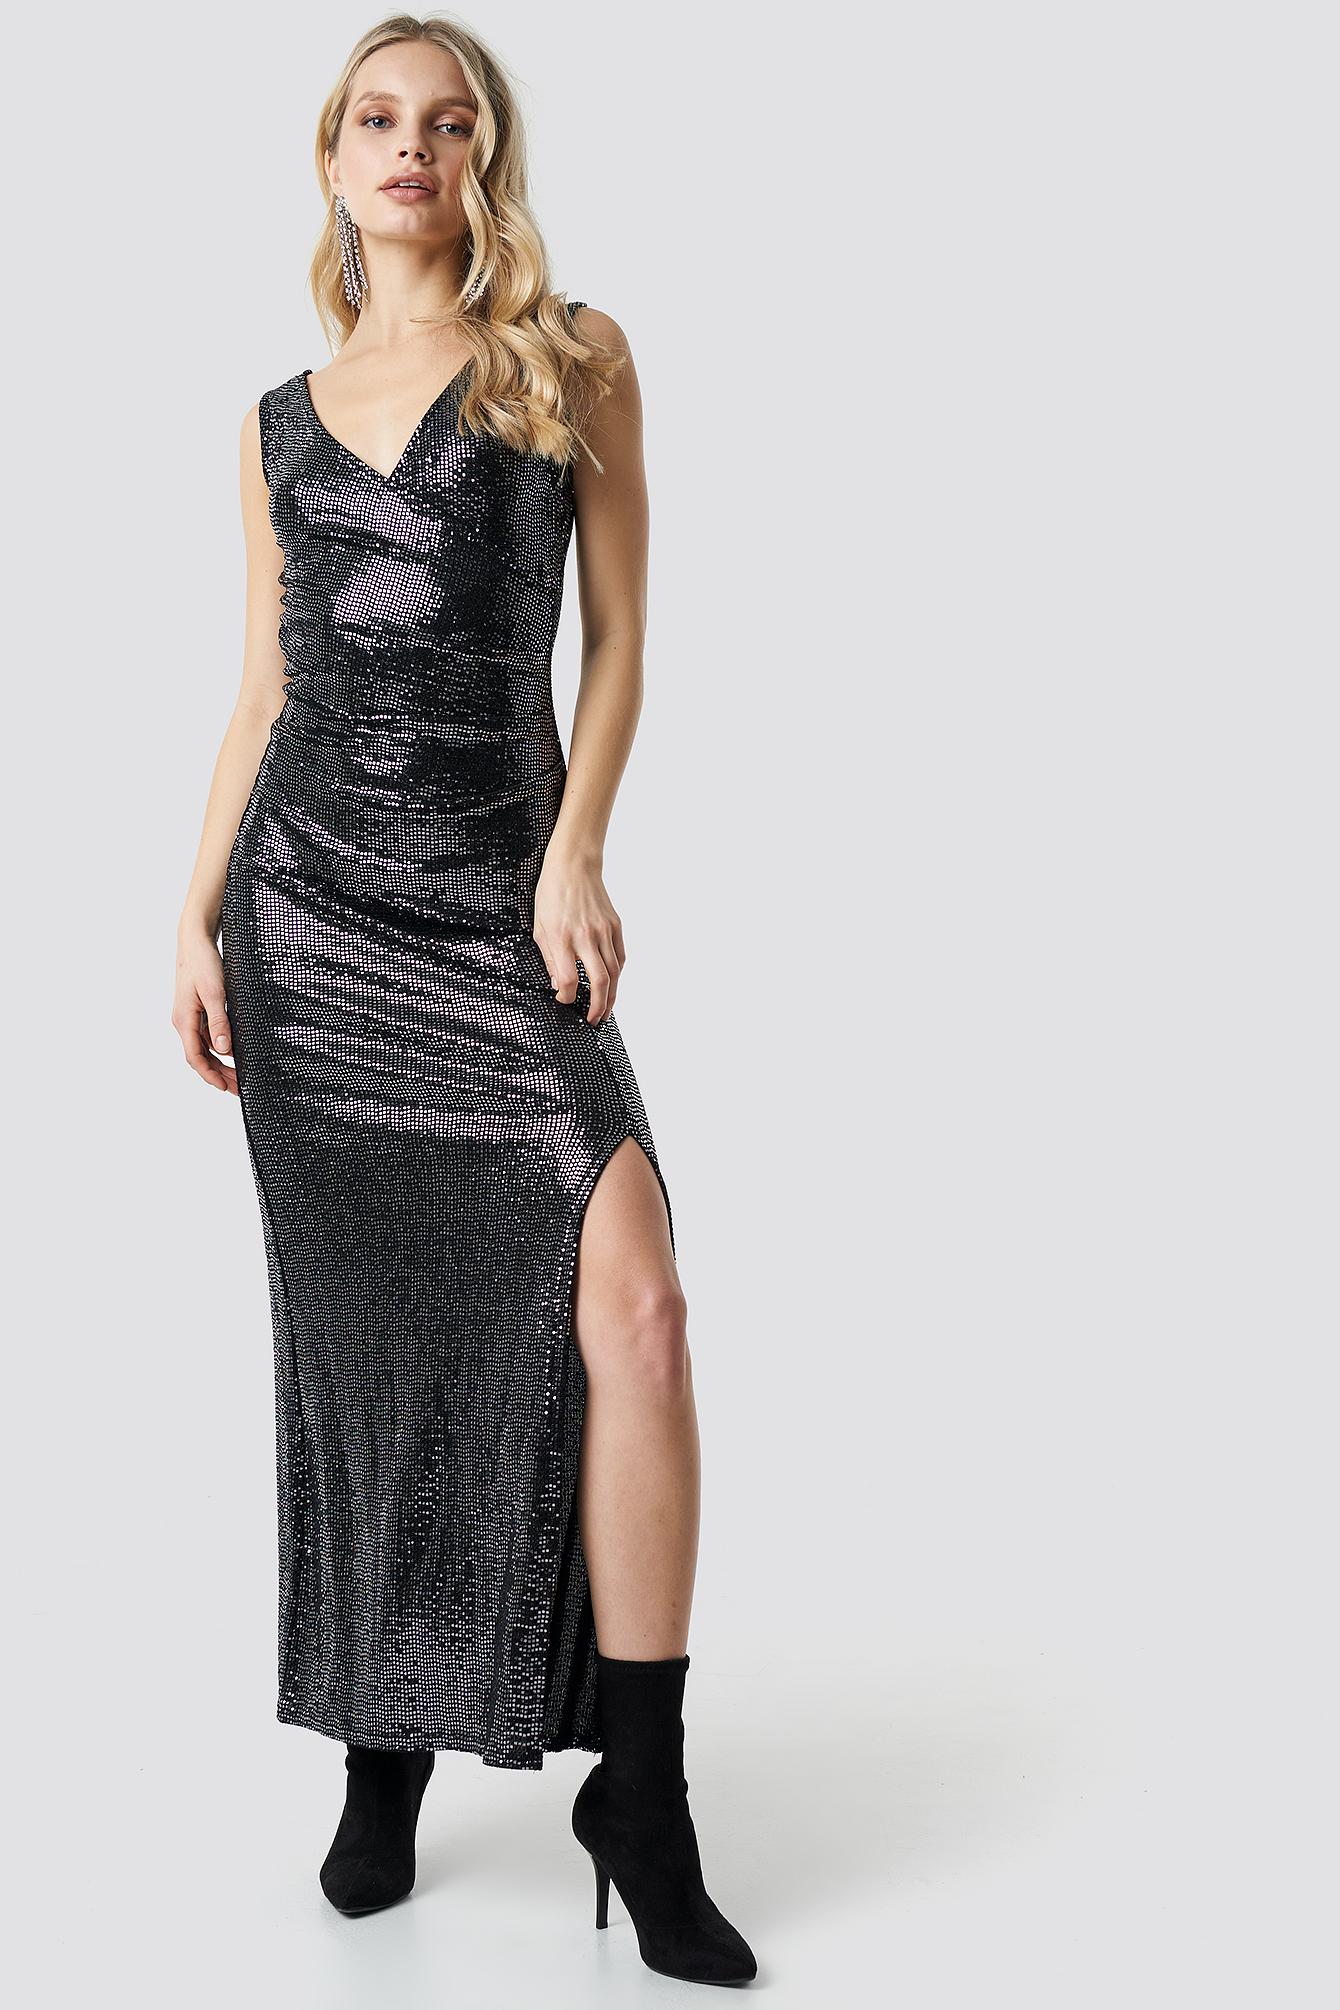 Ernt 4 Dress NA-KDLOUNGE.DE